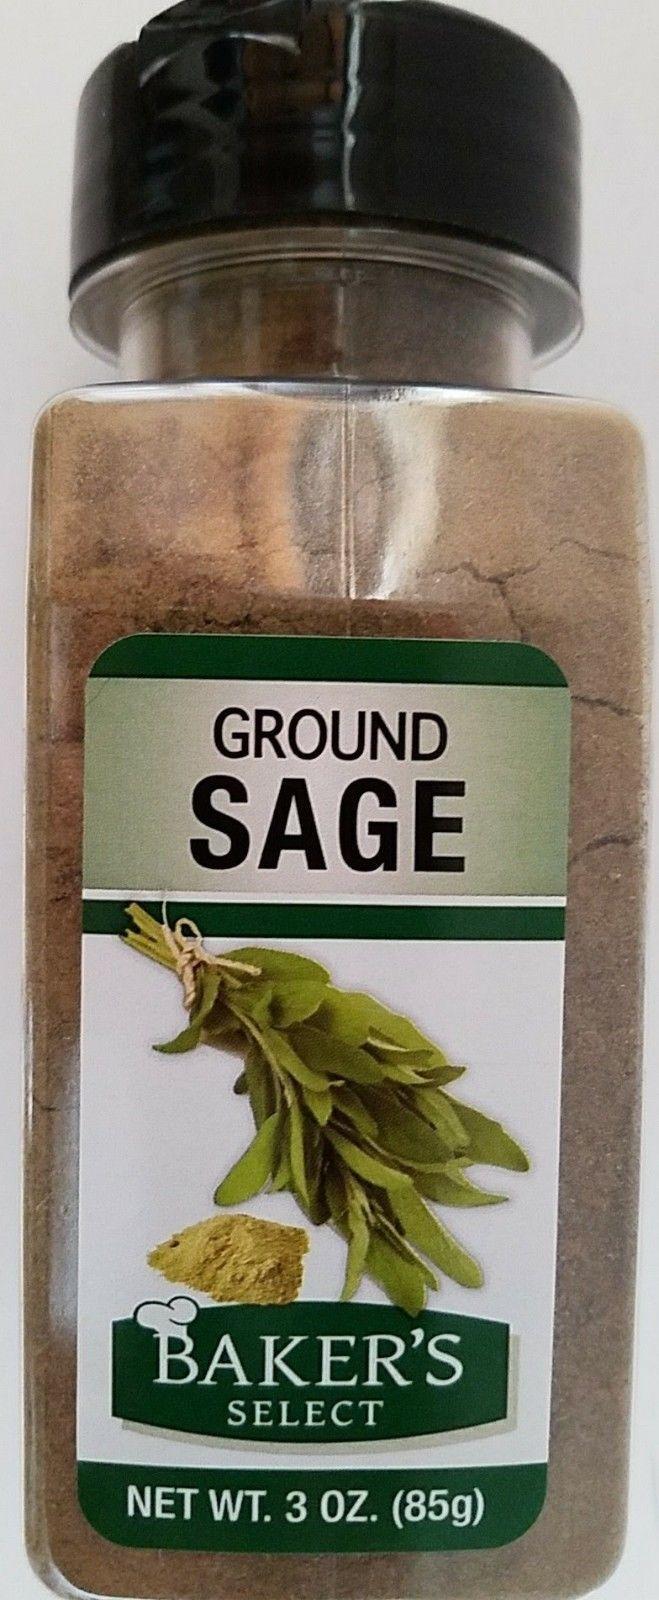 Culinary Herbs, Basil, Chives, Cilantro, Oregano, Parsley, Rosemary, Sage, s1